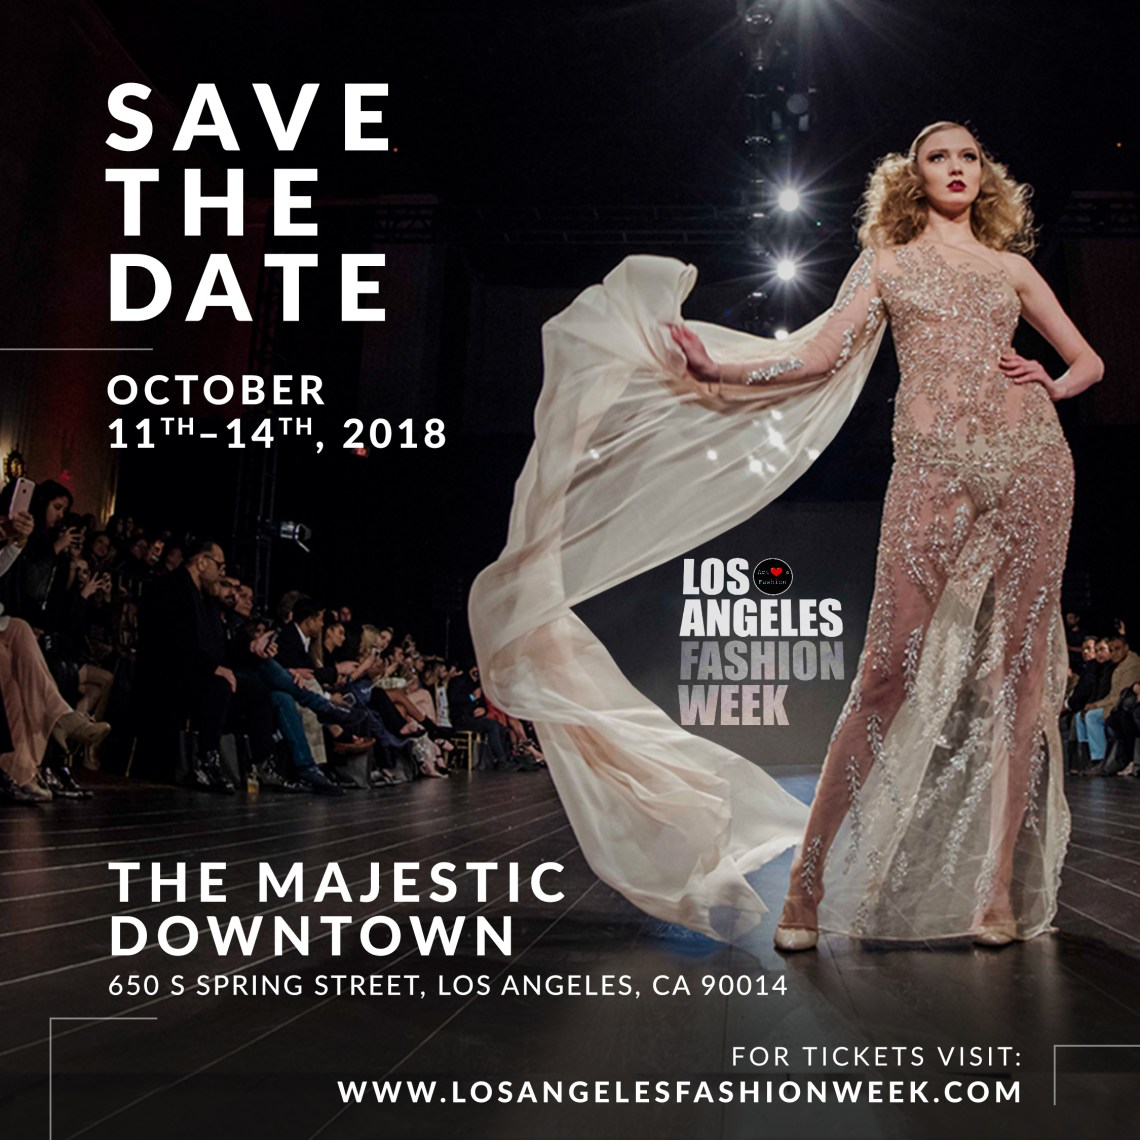 Los Angeles Fashion Week Schedule